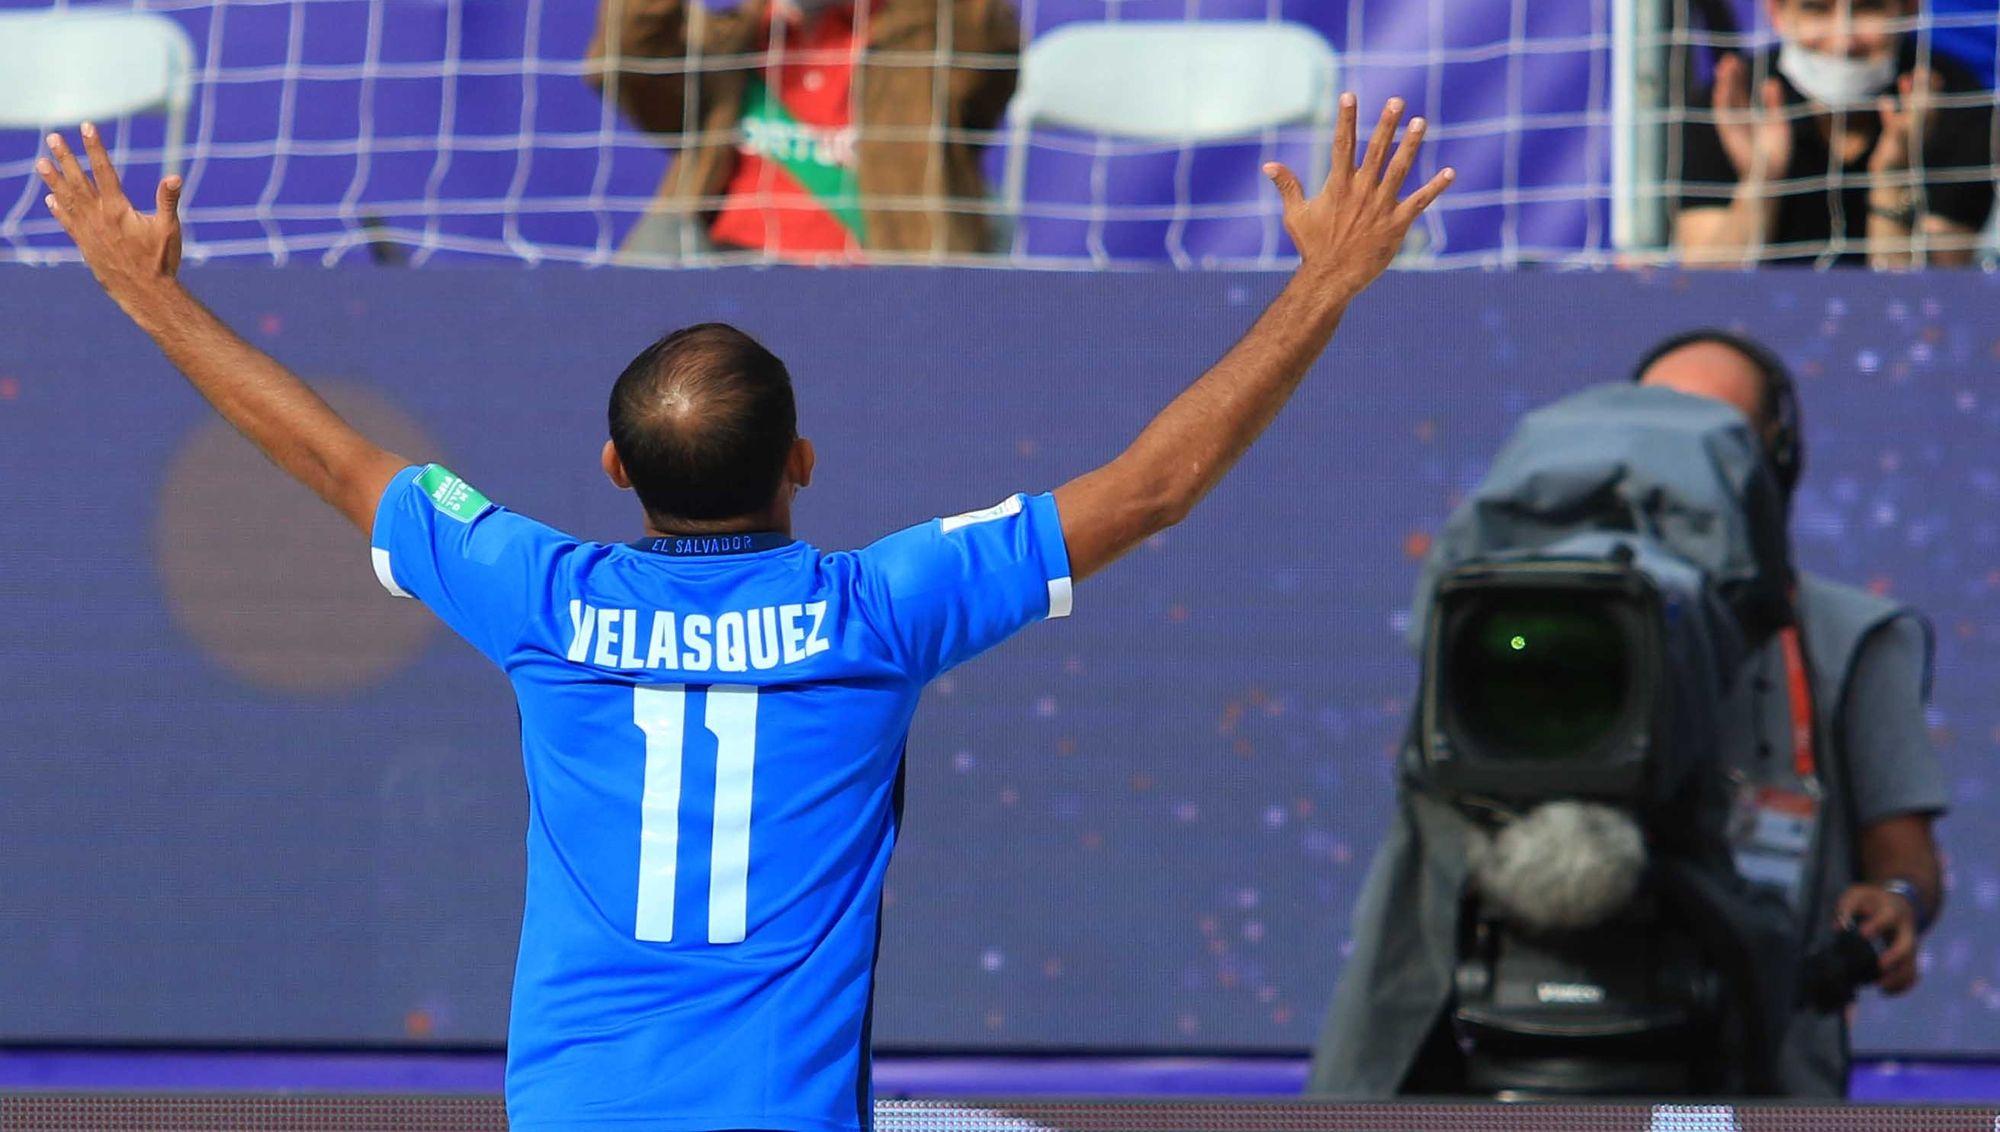 LA FIFA DESTACÓ GOL DE FRANK VELÁSQUEZ